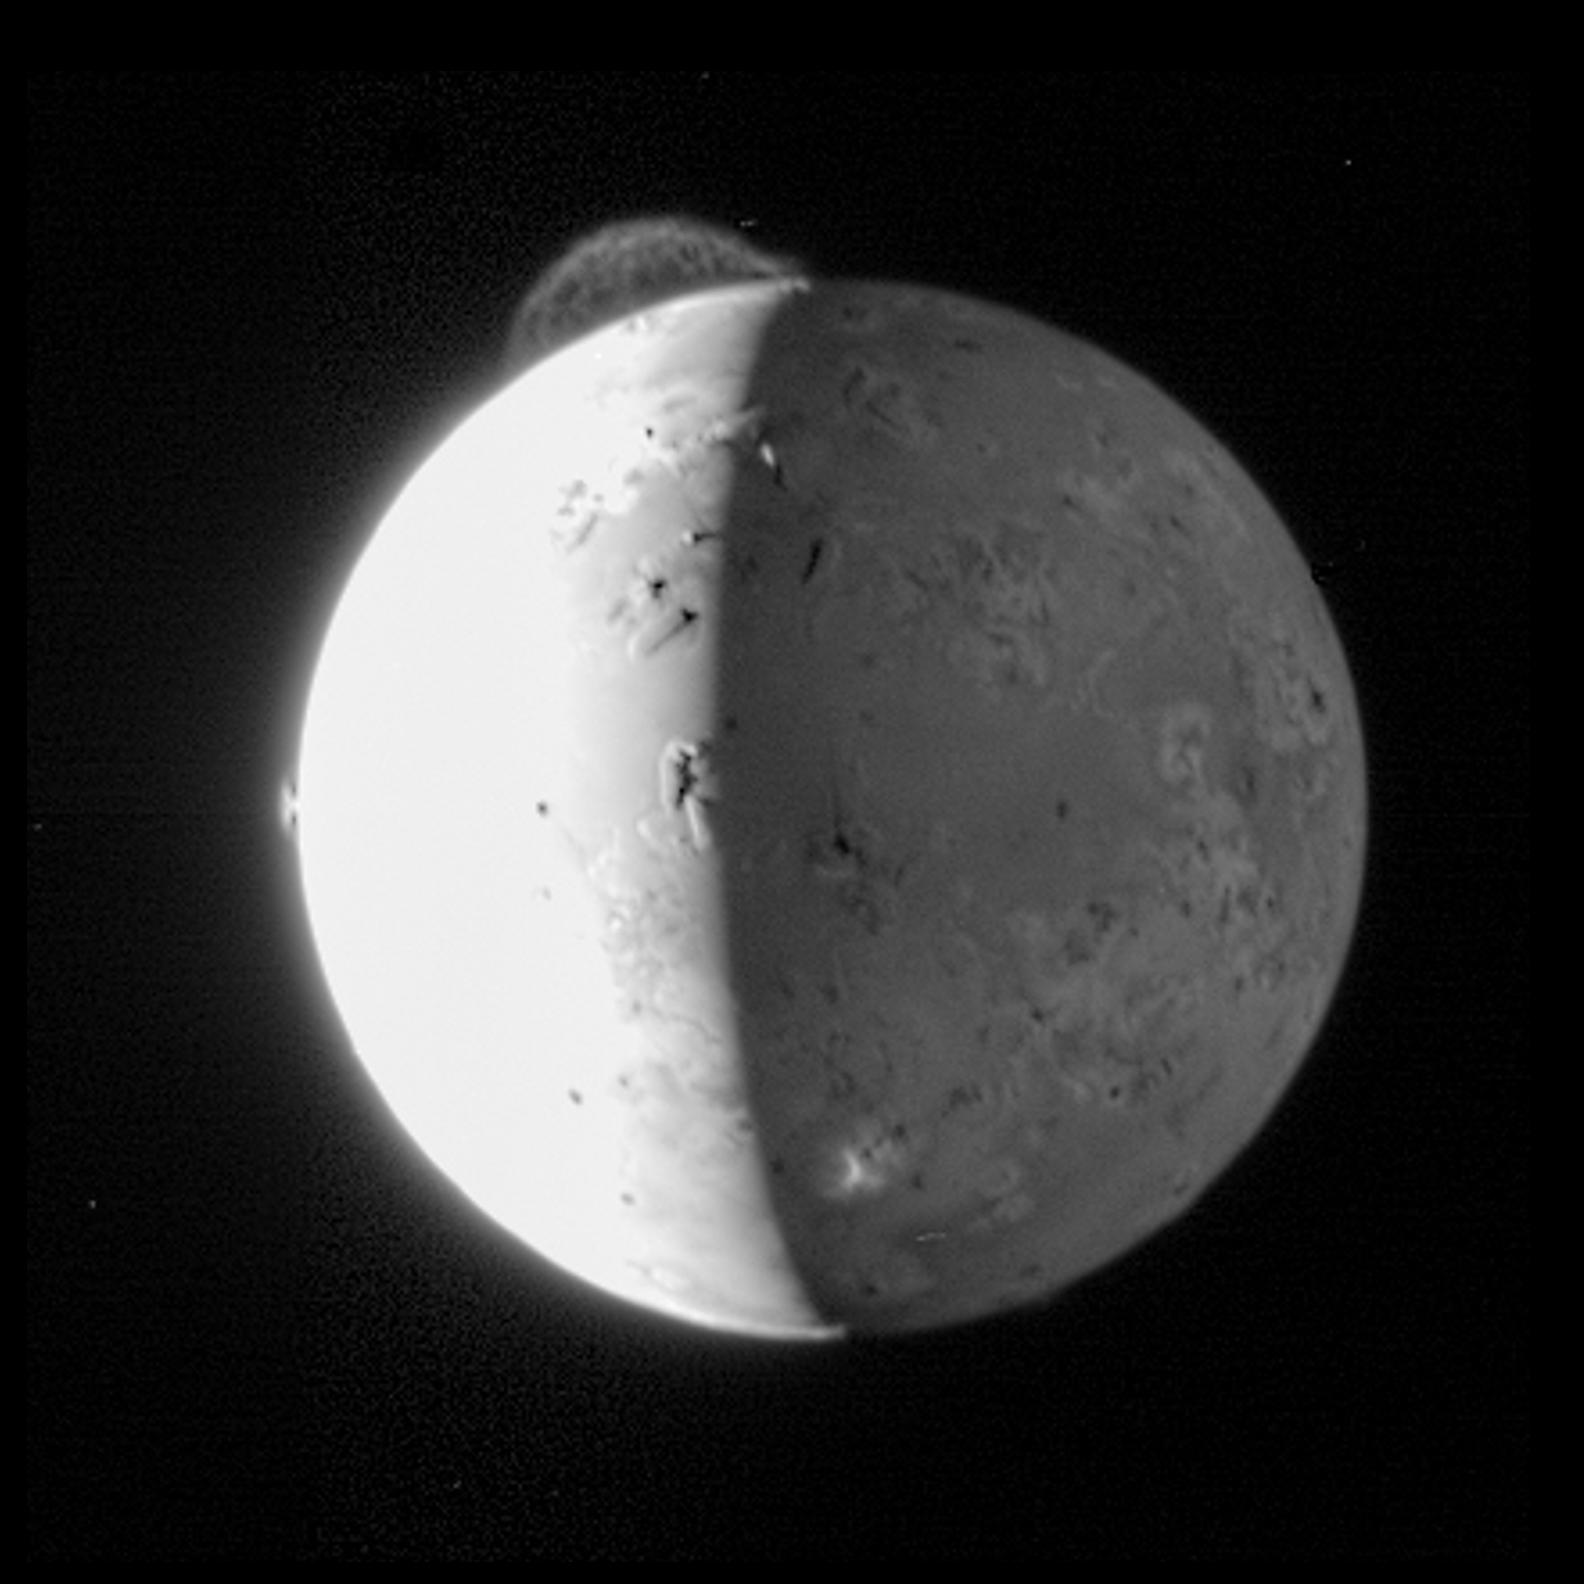 Io Volcano Observer Following the Clues to Planet Evolution   NASA